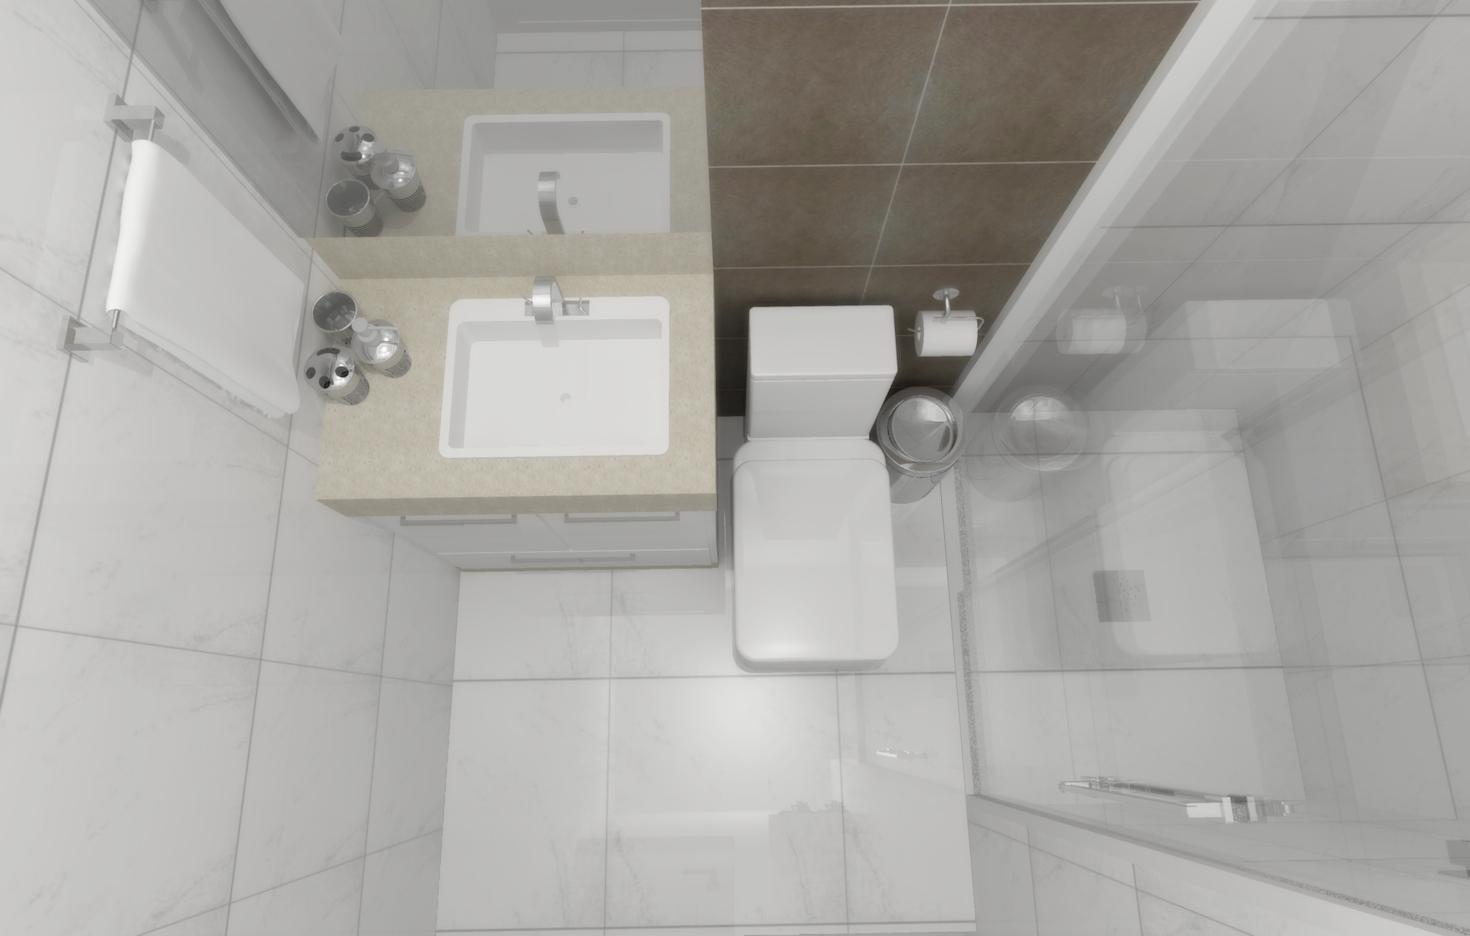 Banheiros Pequenos Banheiros Modernos Decorados Banheiros Decorados  #595146 1470 936